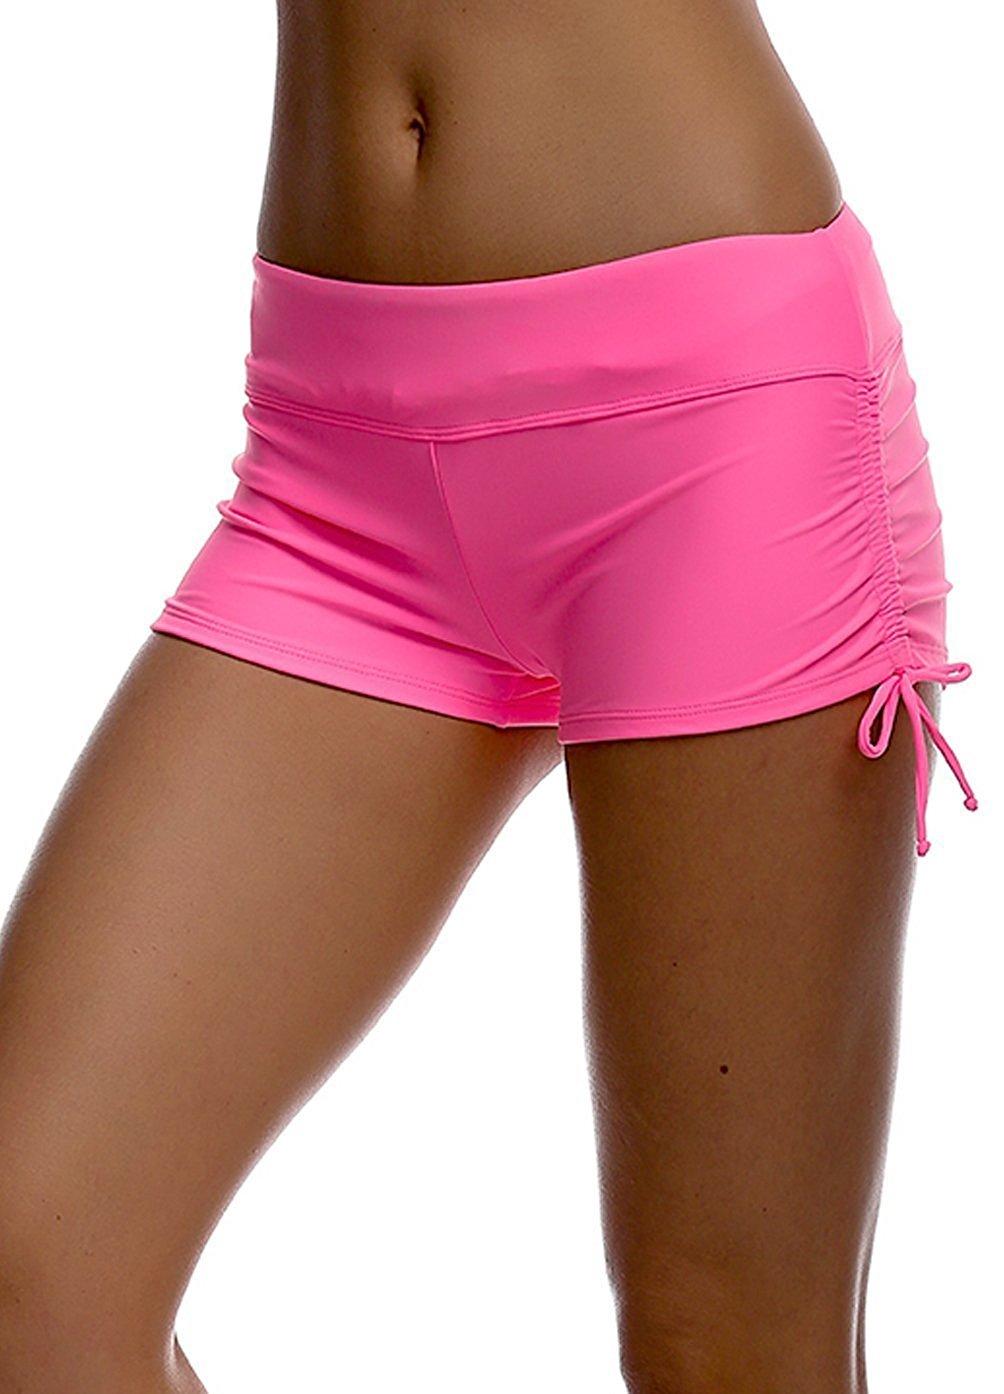 Women Girls Adjustable Drawstring Swim Shorts Bikini Boy Style Short Brief Bottoms Imixshopcs